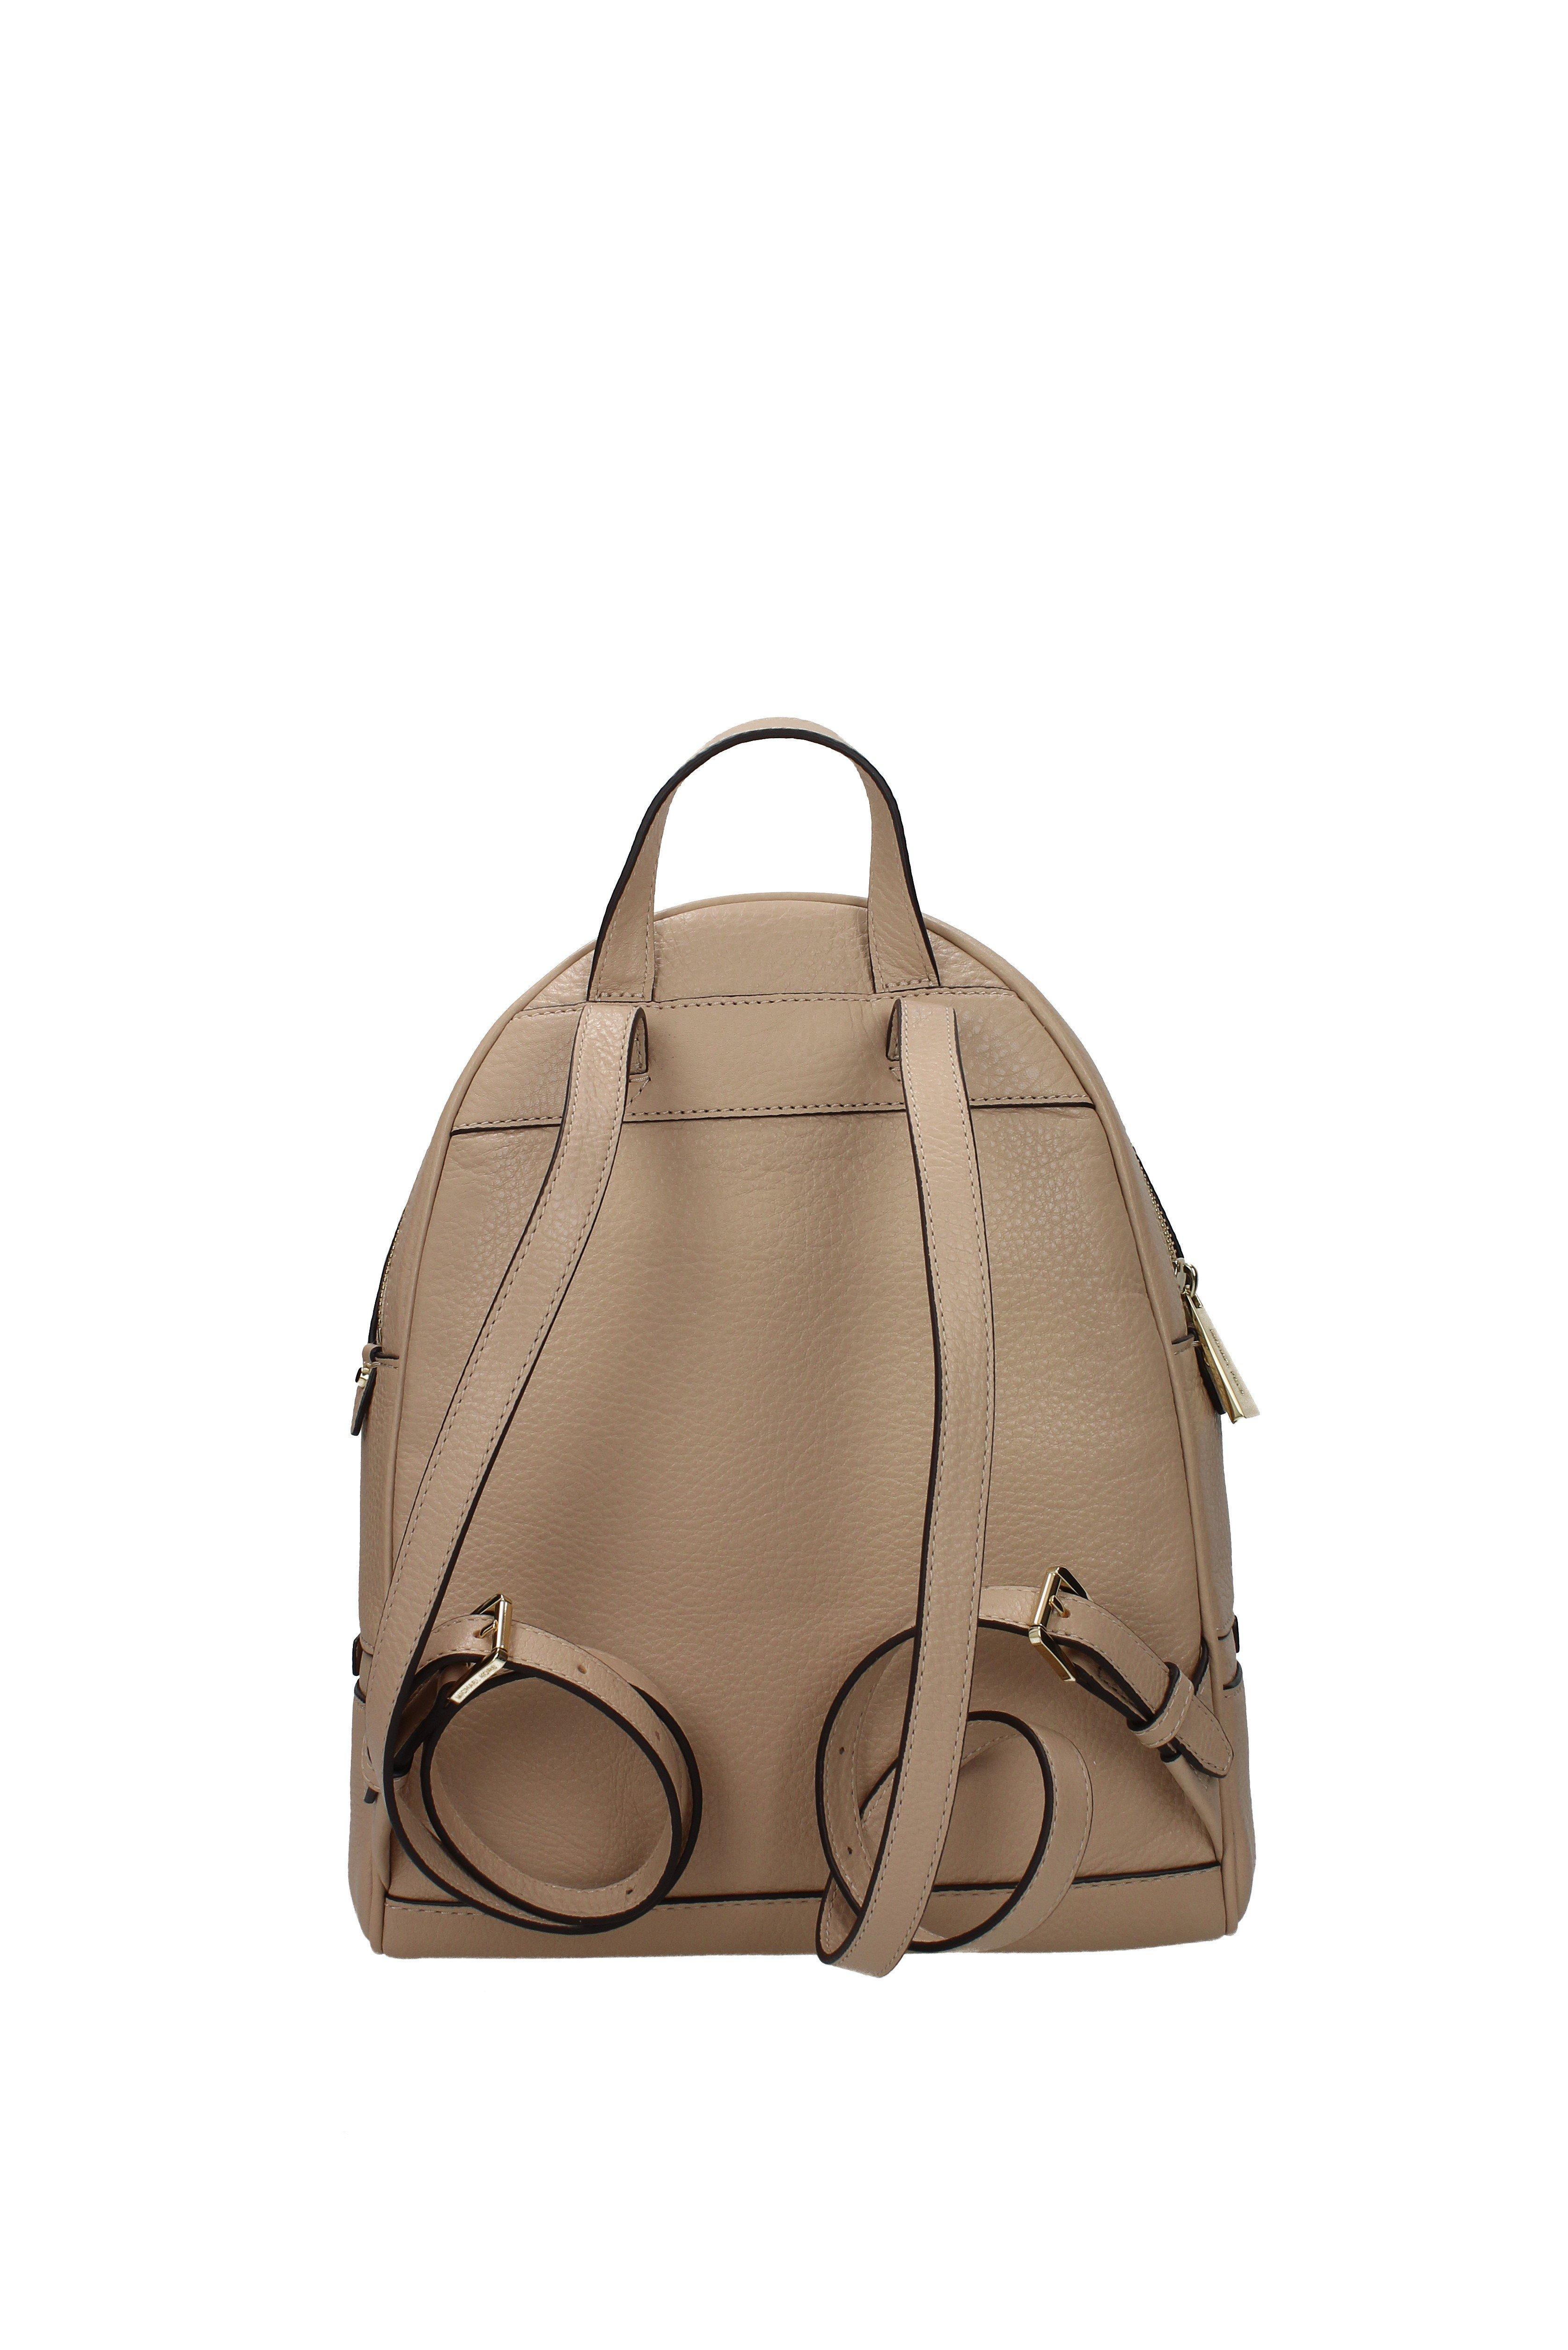 08daea9abc77 Michael Kors - Multicolor Backpacks And Bumbags Rhea Zip Md Women Pink -  Lyst. View fullscreen